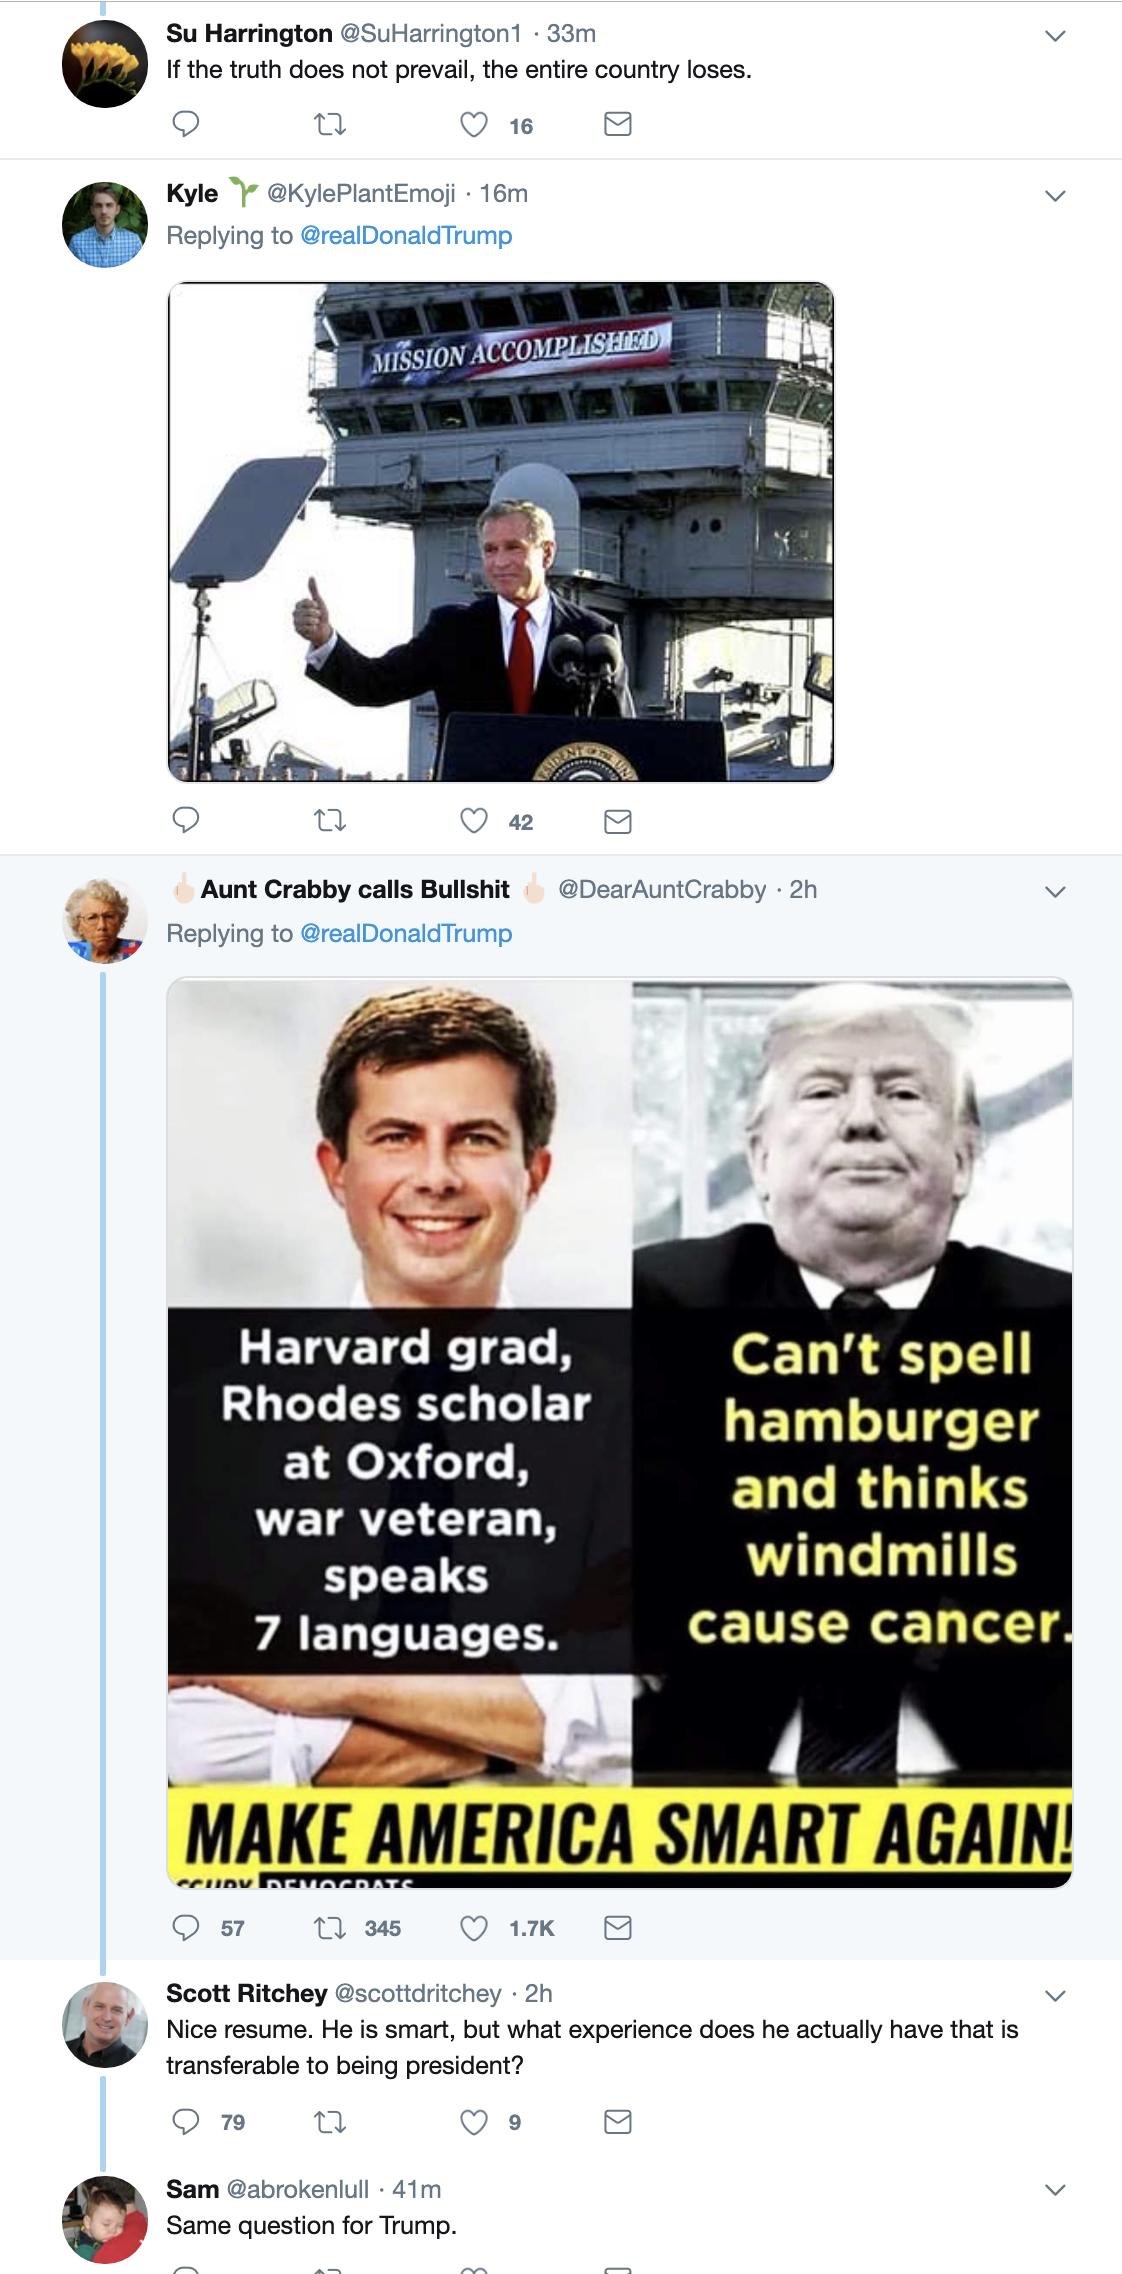 Screen-Shot-2019-05-30-at-1.30.59-PM Trump Tweets Arrogant Mueller Meme & Gets Eaten Alive Immediately Corruption Crime Donald Trump Election 2016 Impeachment Investigation Mueller Politics Robert Mueller Russia Top Stories